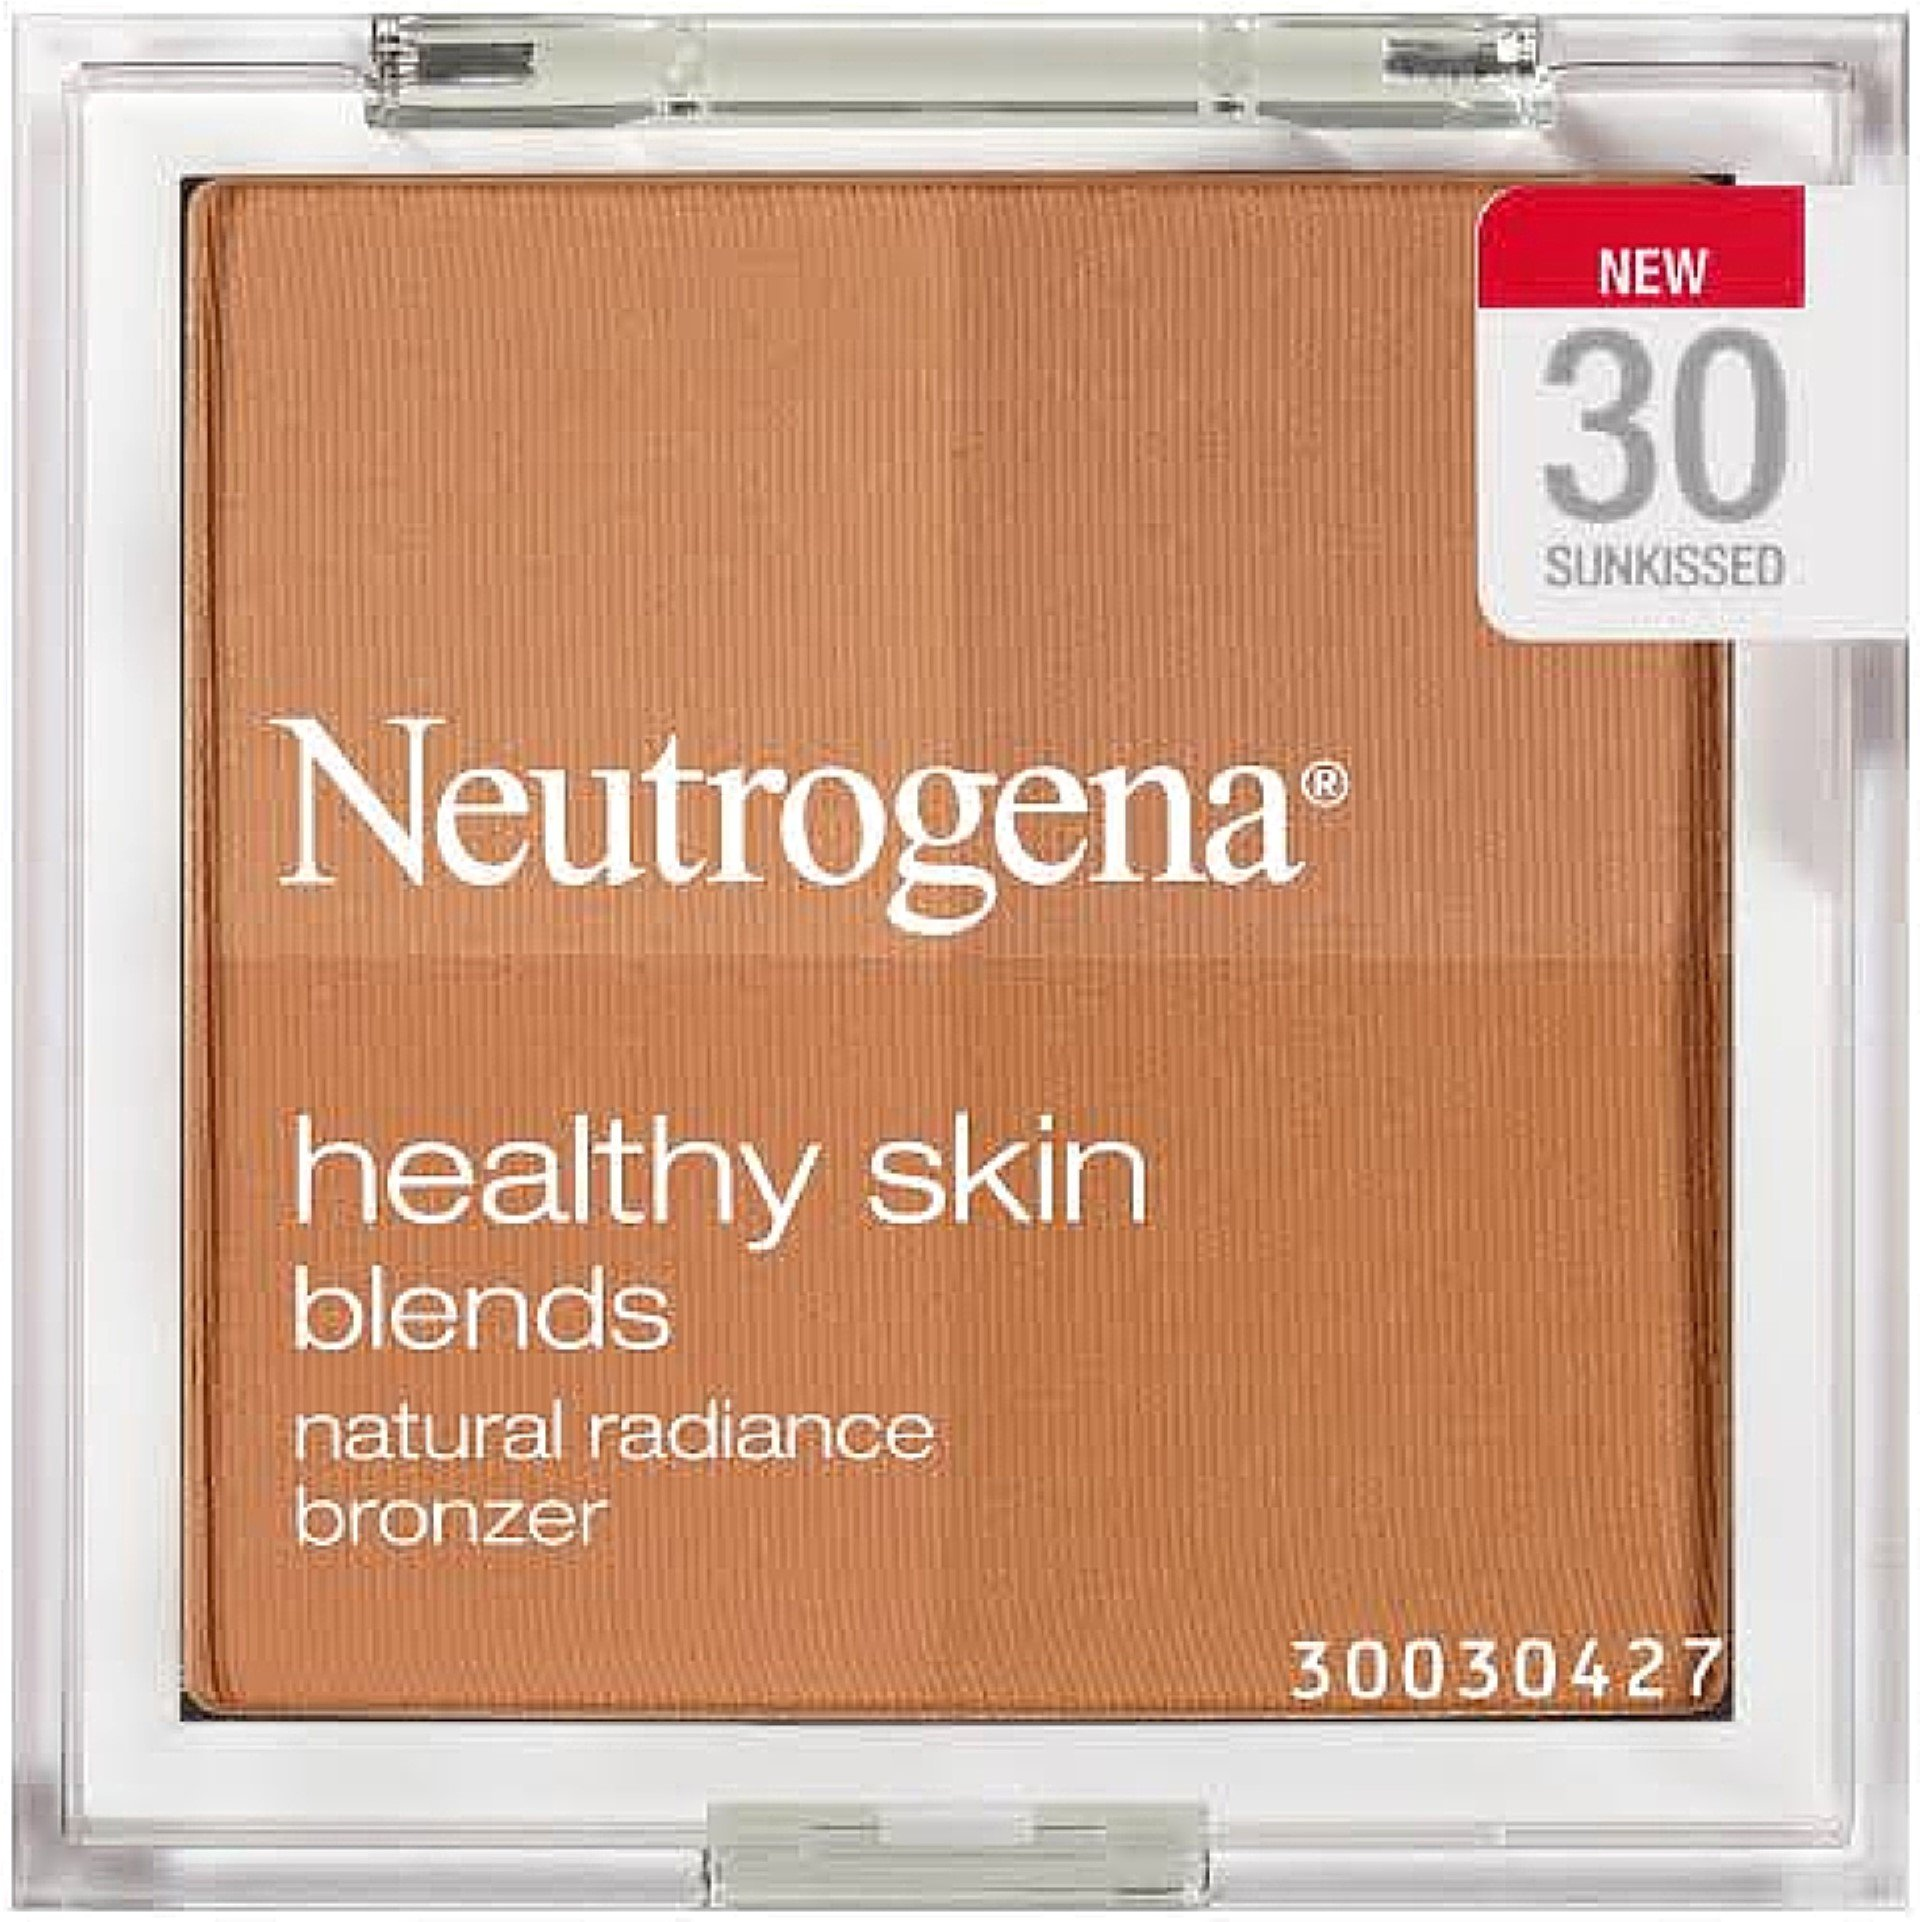 Neutrogena Healthy Skin Blends Natural Radiance Bronzer, Sunkissed 0.30 oz (10 Pack)